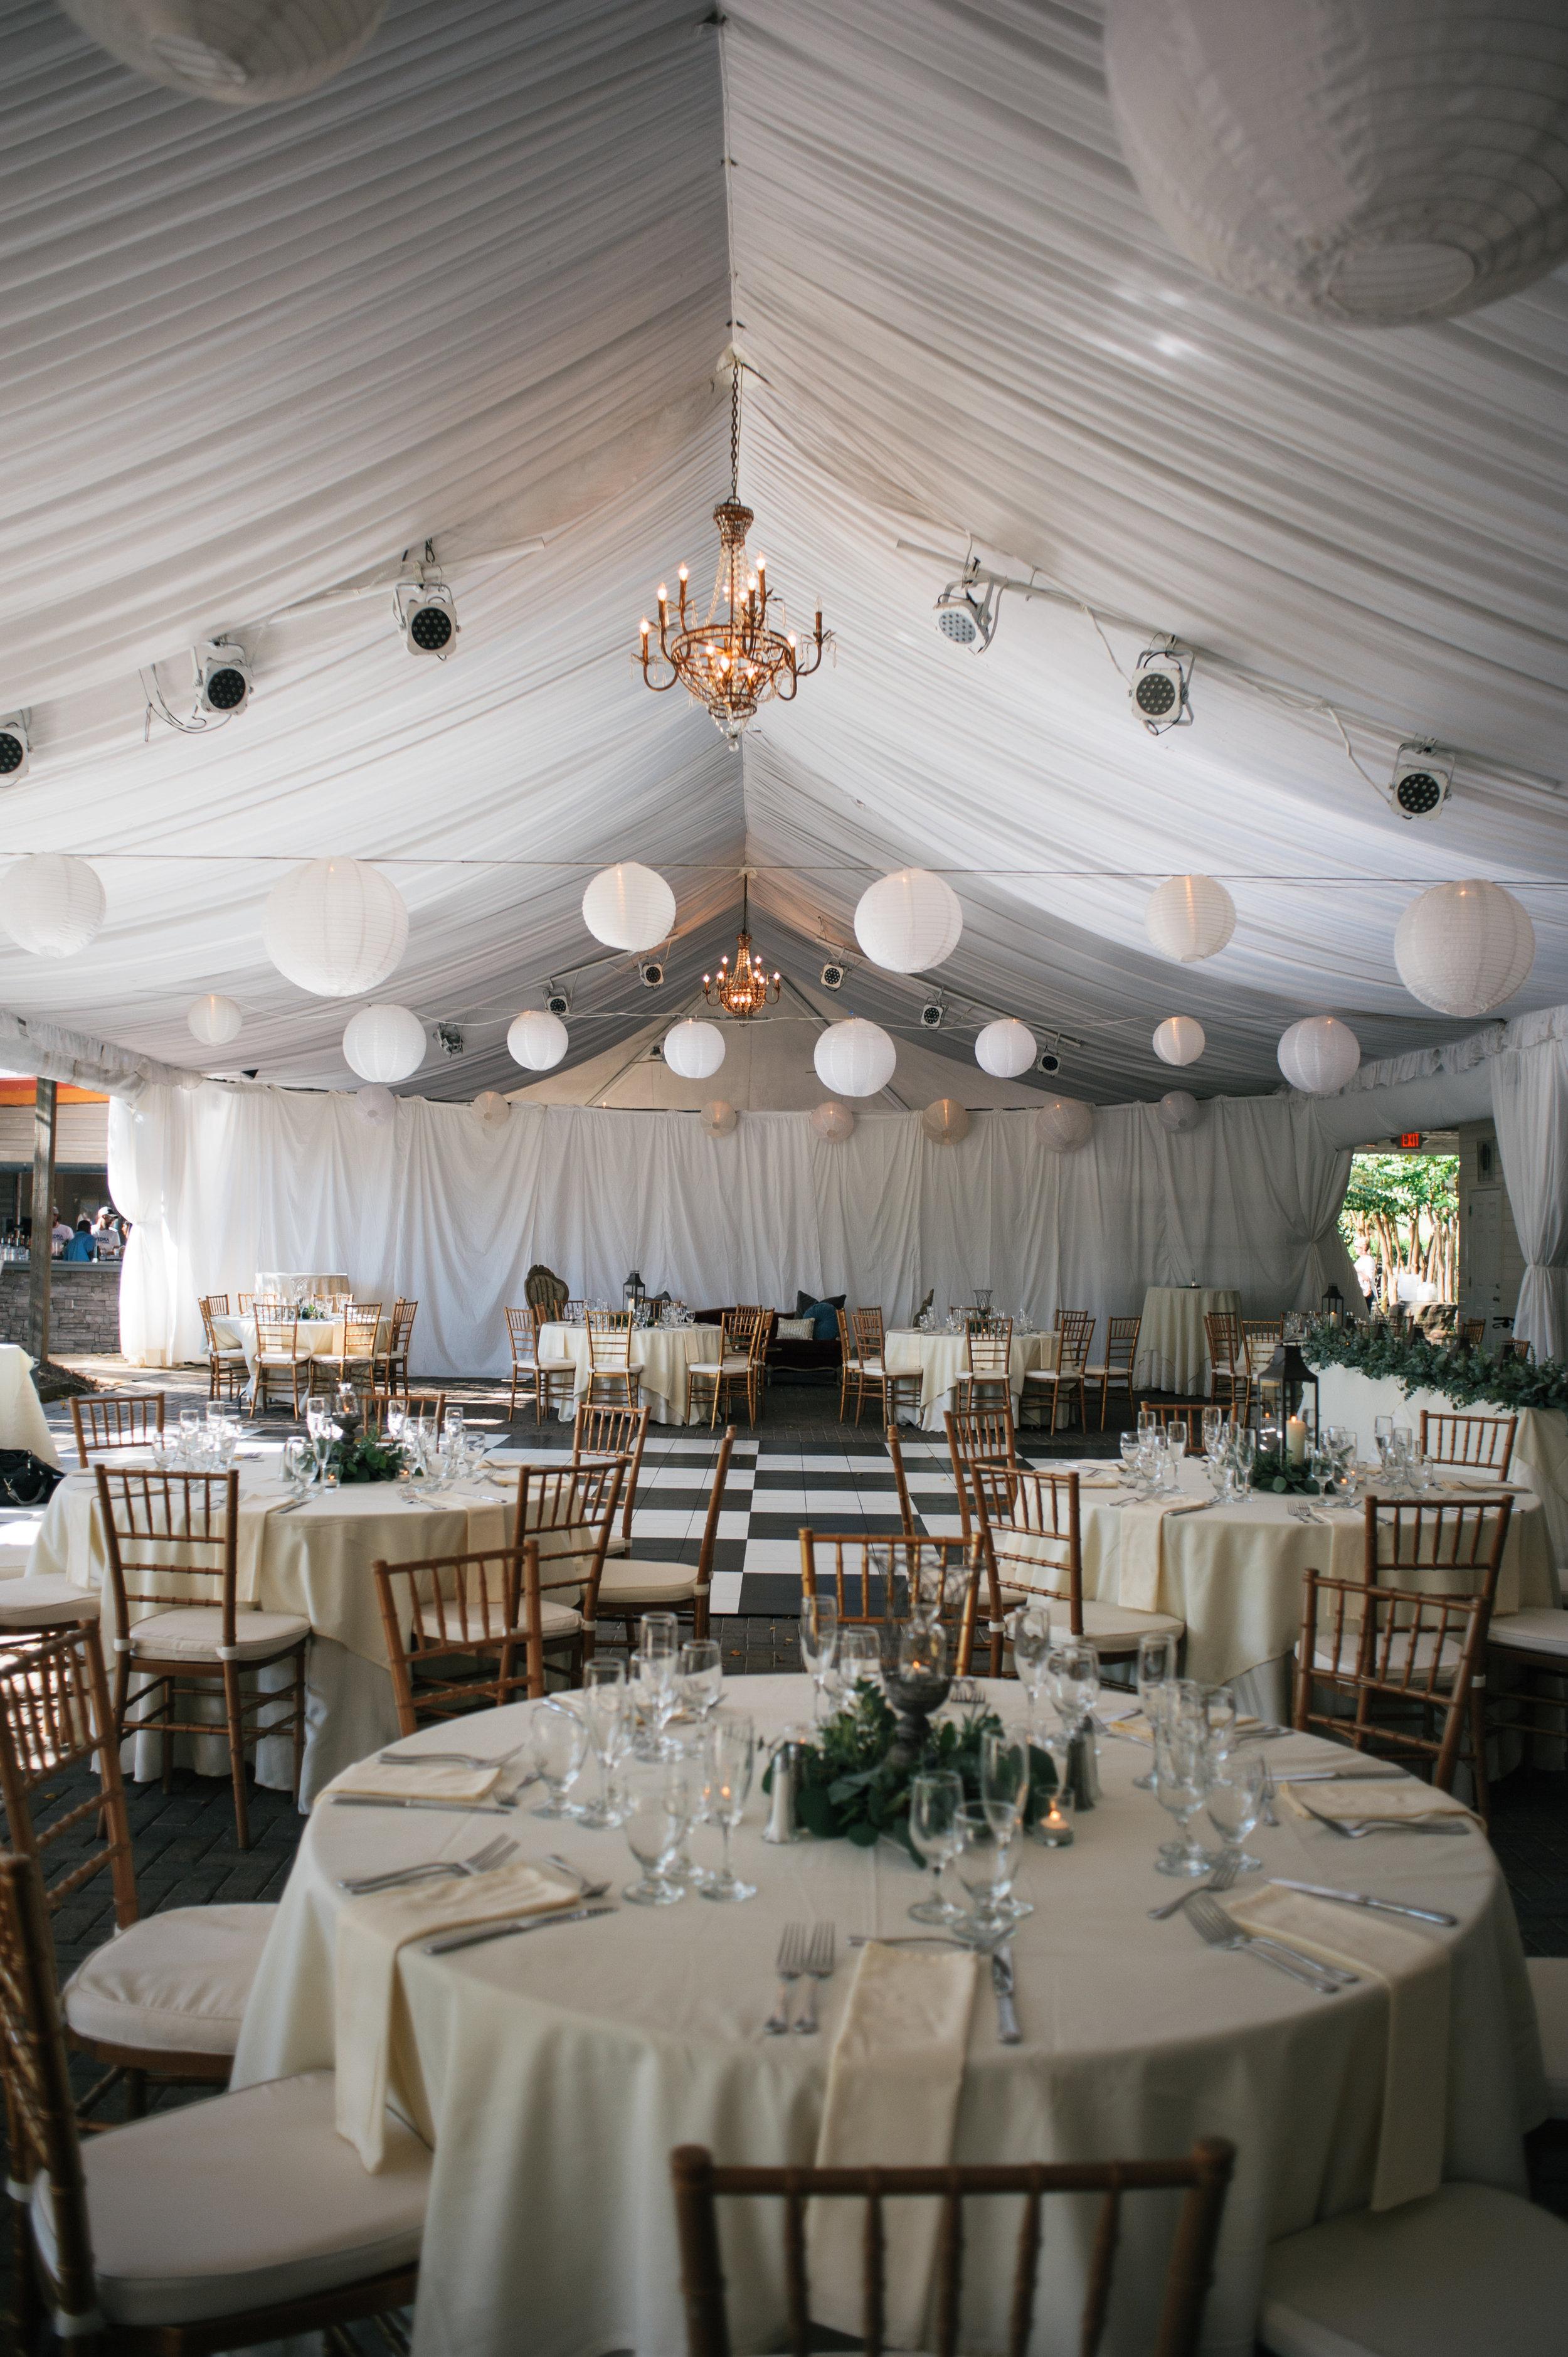 kristin-and-peter-atlanta-georgia-wedding-october-8th-2016 (232 of 1068).jpg